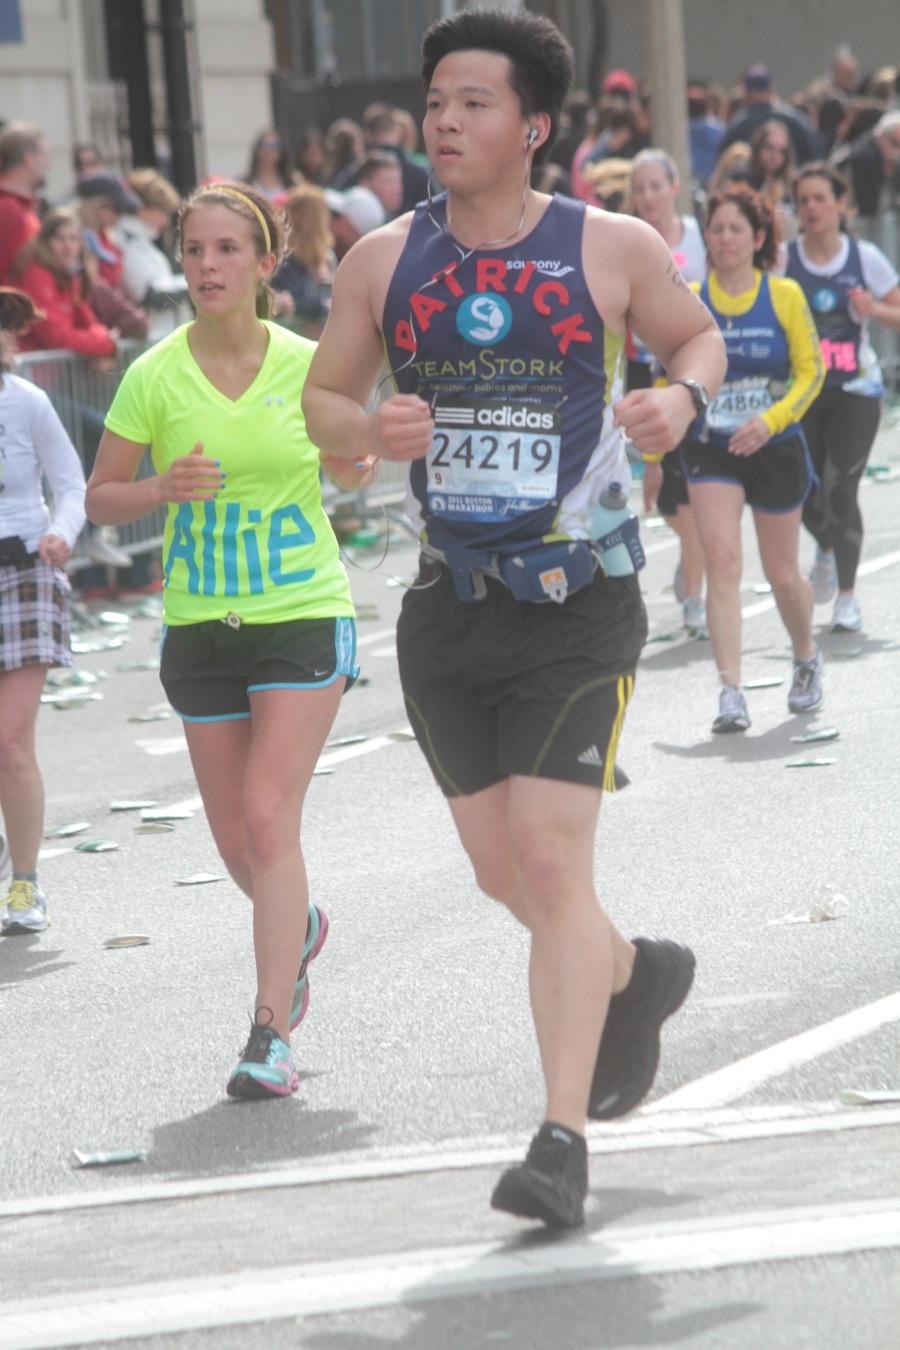 boston marathon 2013 number 24219